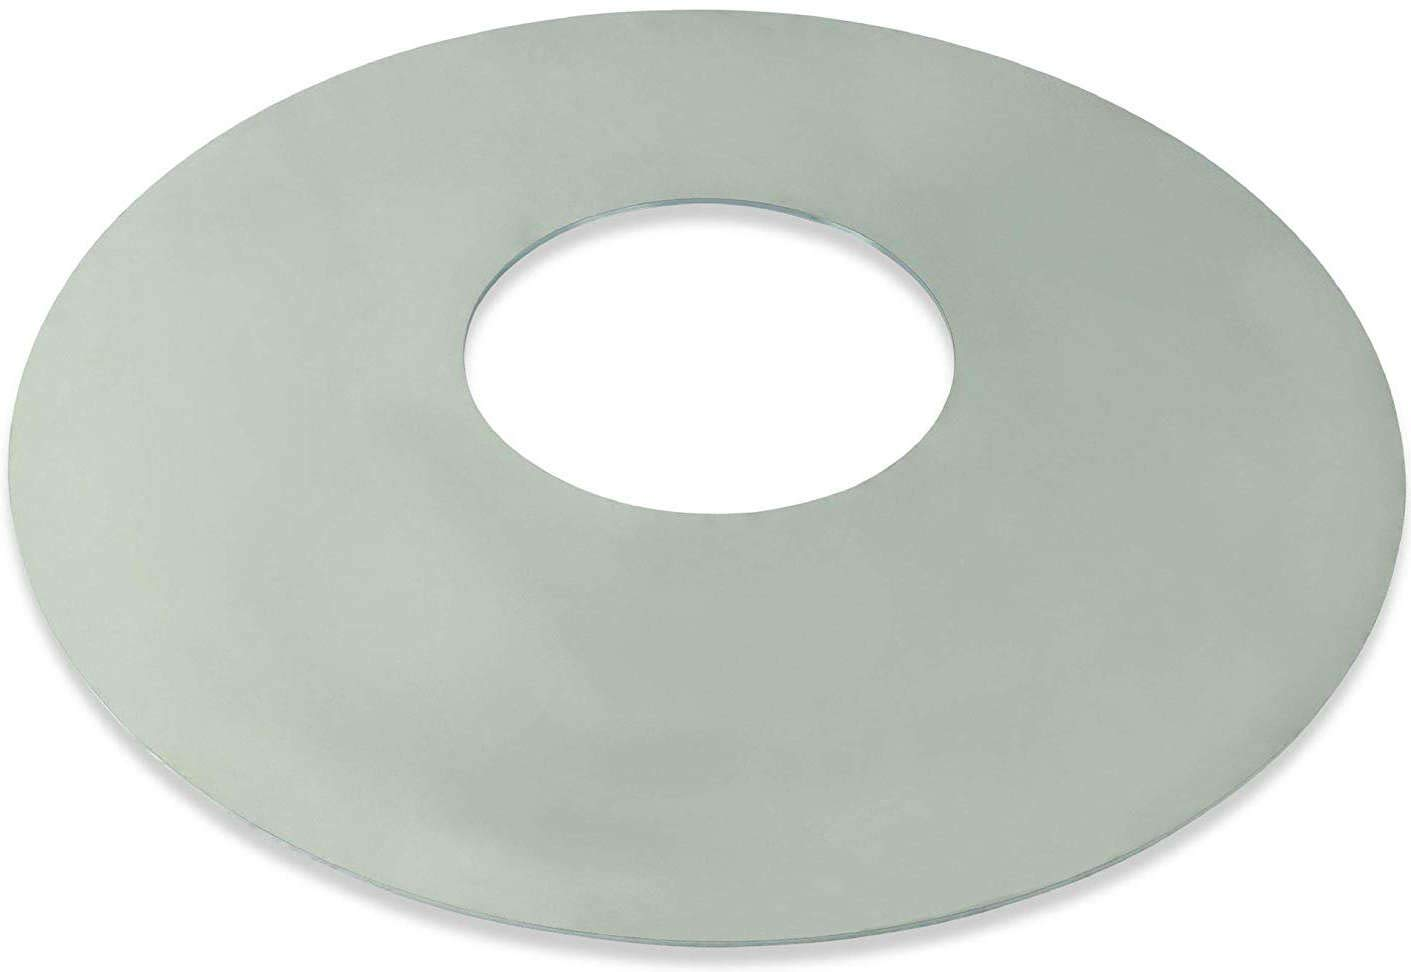 Plancha para parrilla redonda de 57 cm I Plancha para parrilla redonda de 57 cm I Anillo de parrilla anillo de fuego 55 cm I acero disco de barbacoa